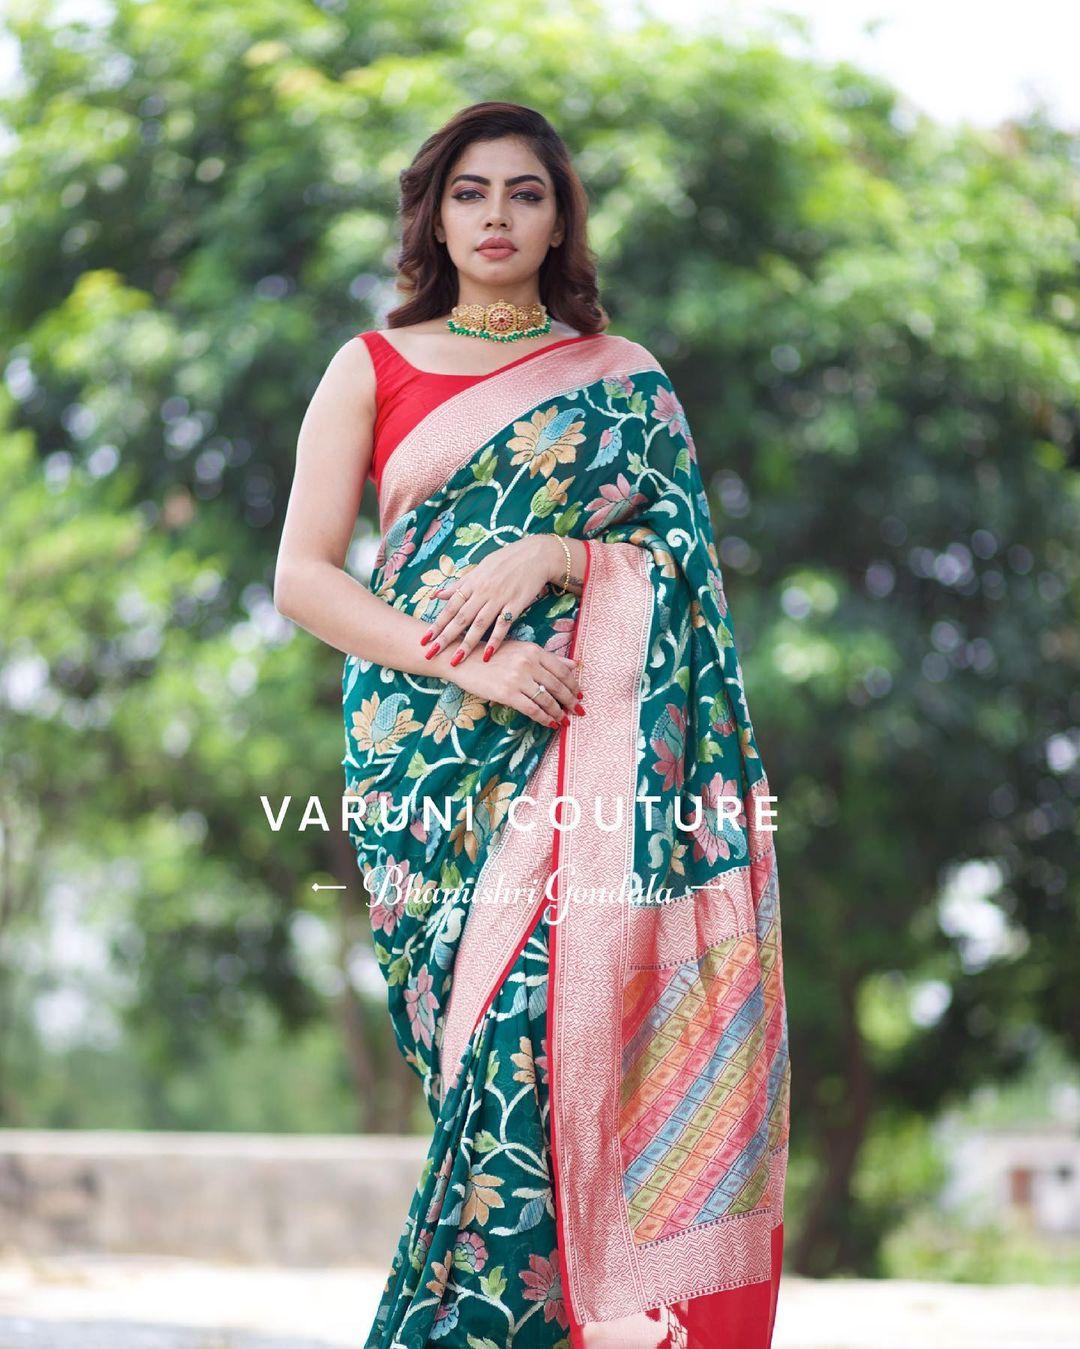 Adorn this gorgeous meenakari master piece . Stunning green color Meenakari saree. 2021-07-09